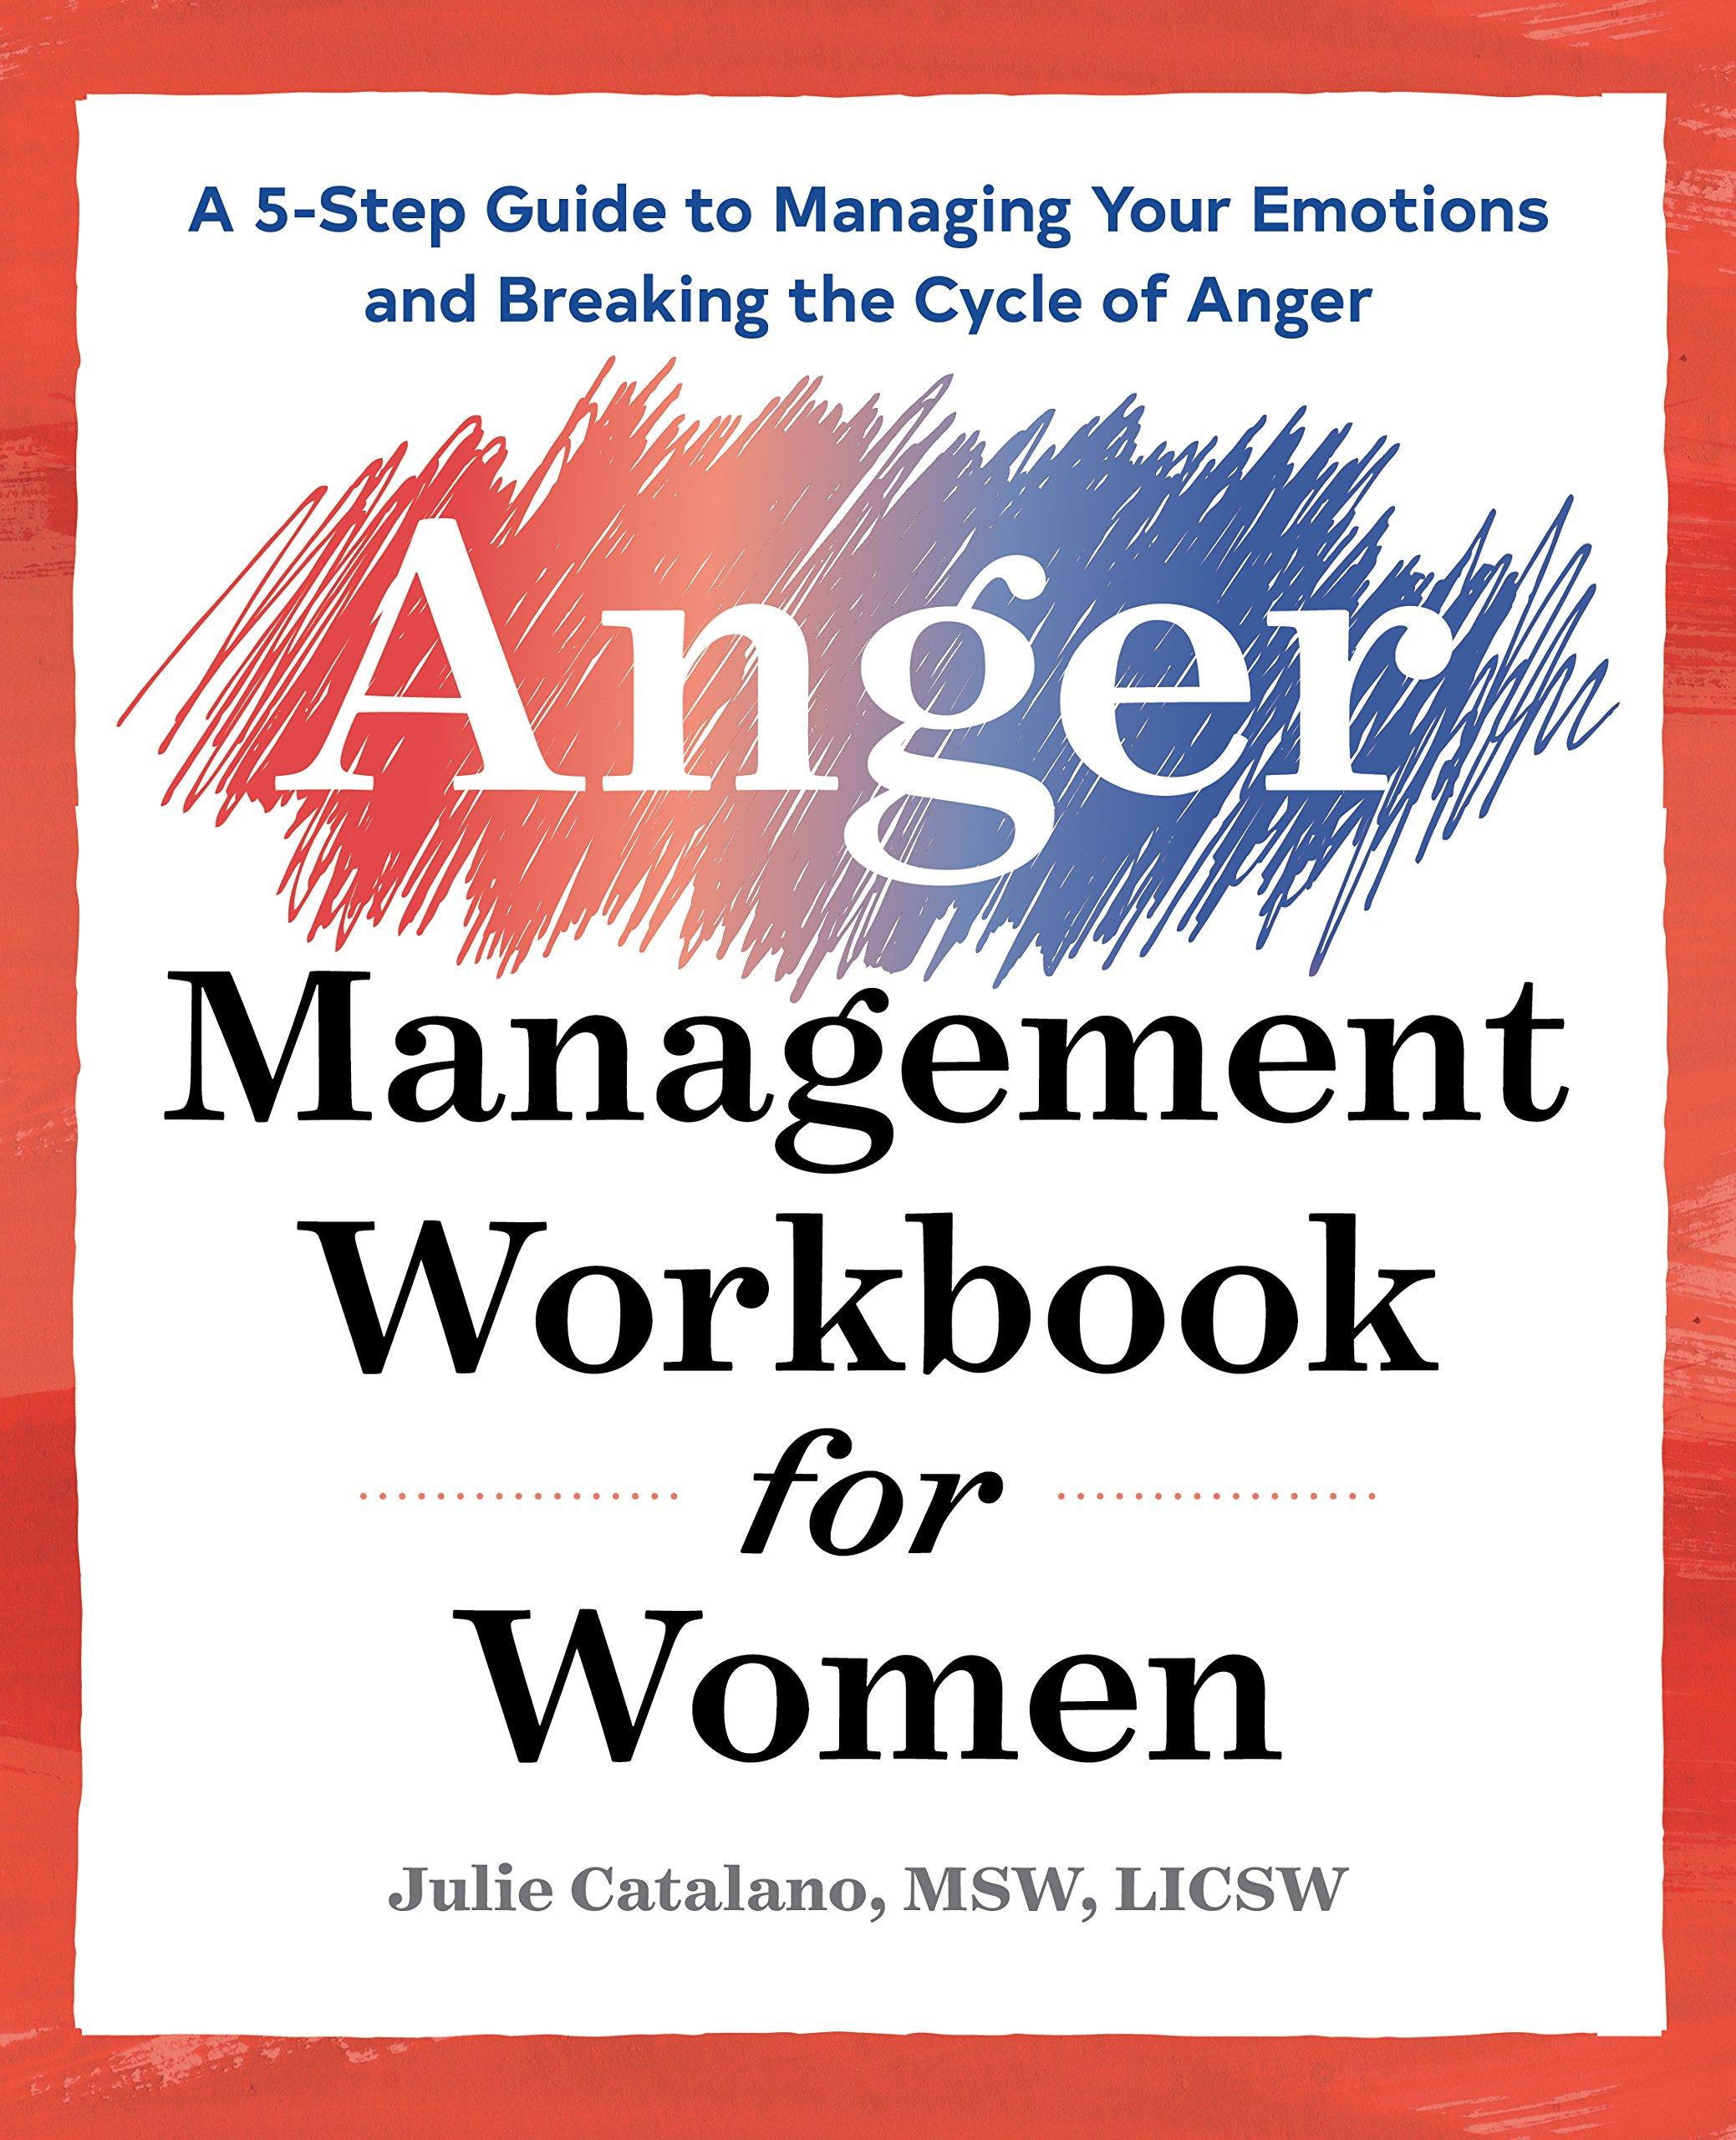 Test management printable anger Adult Anger